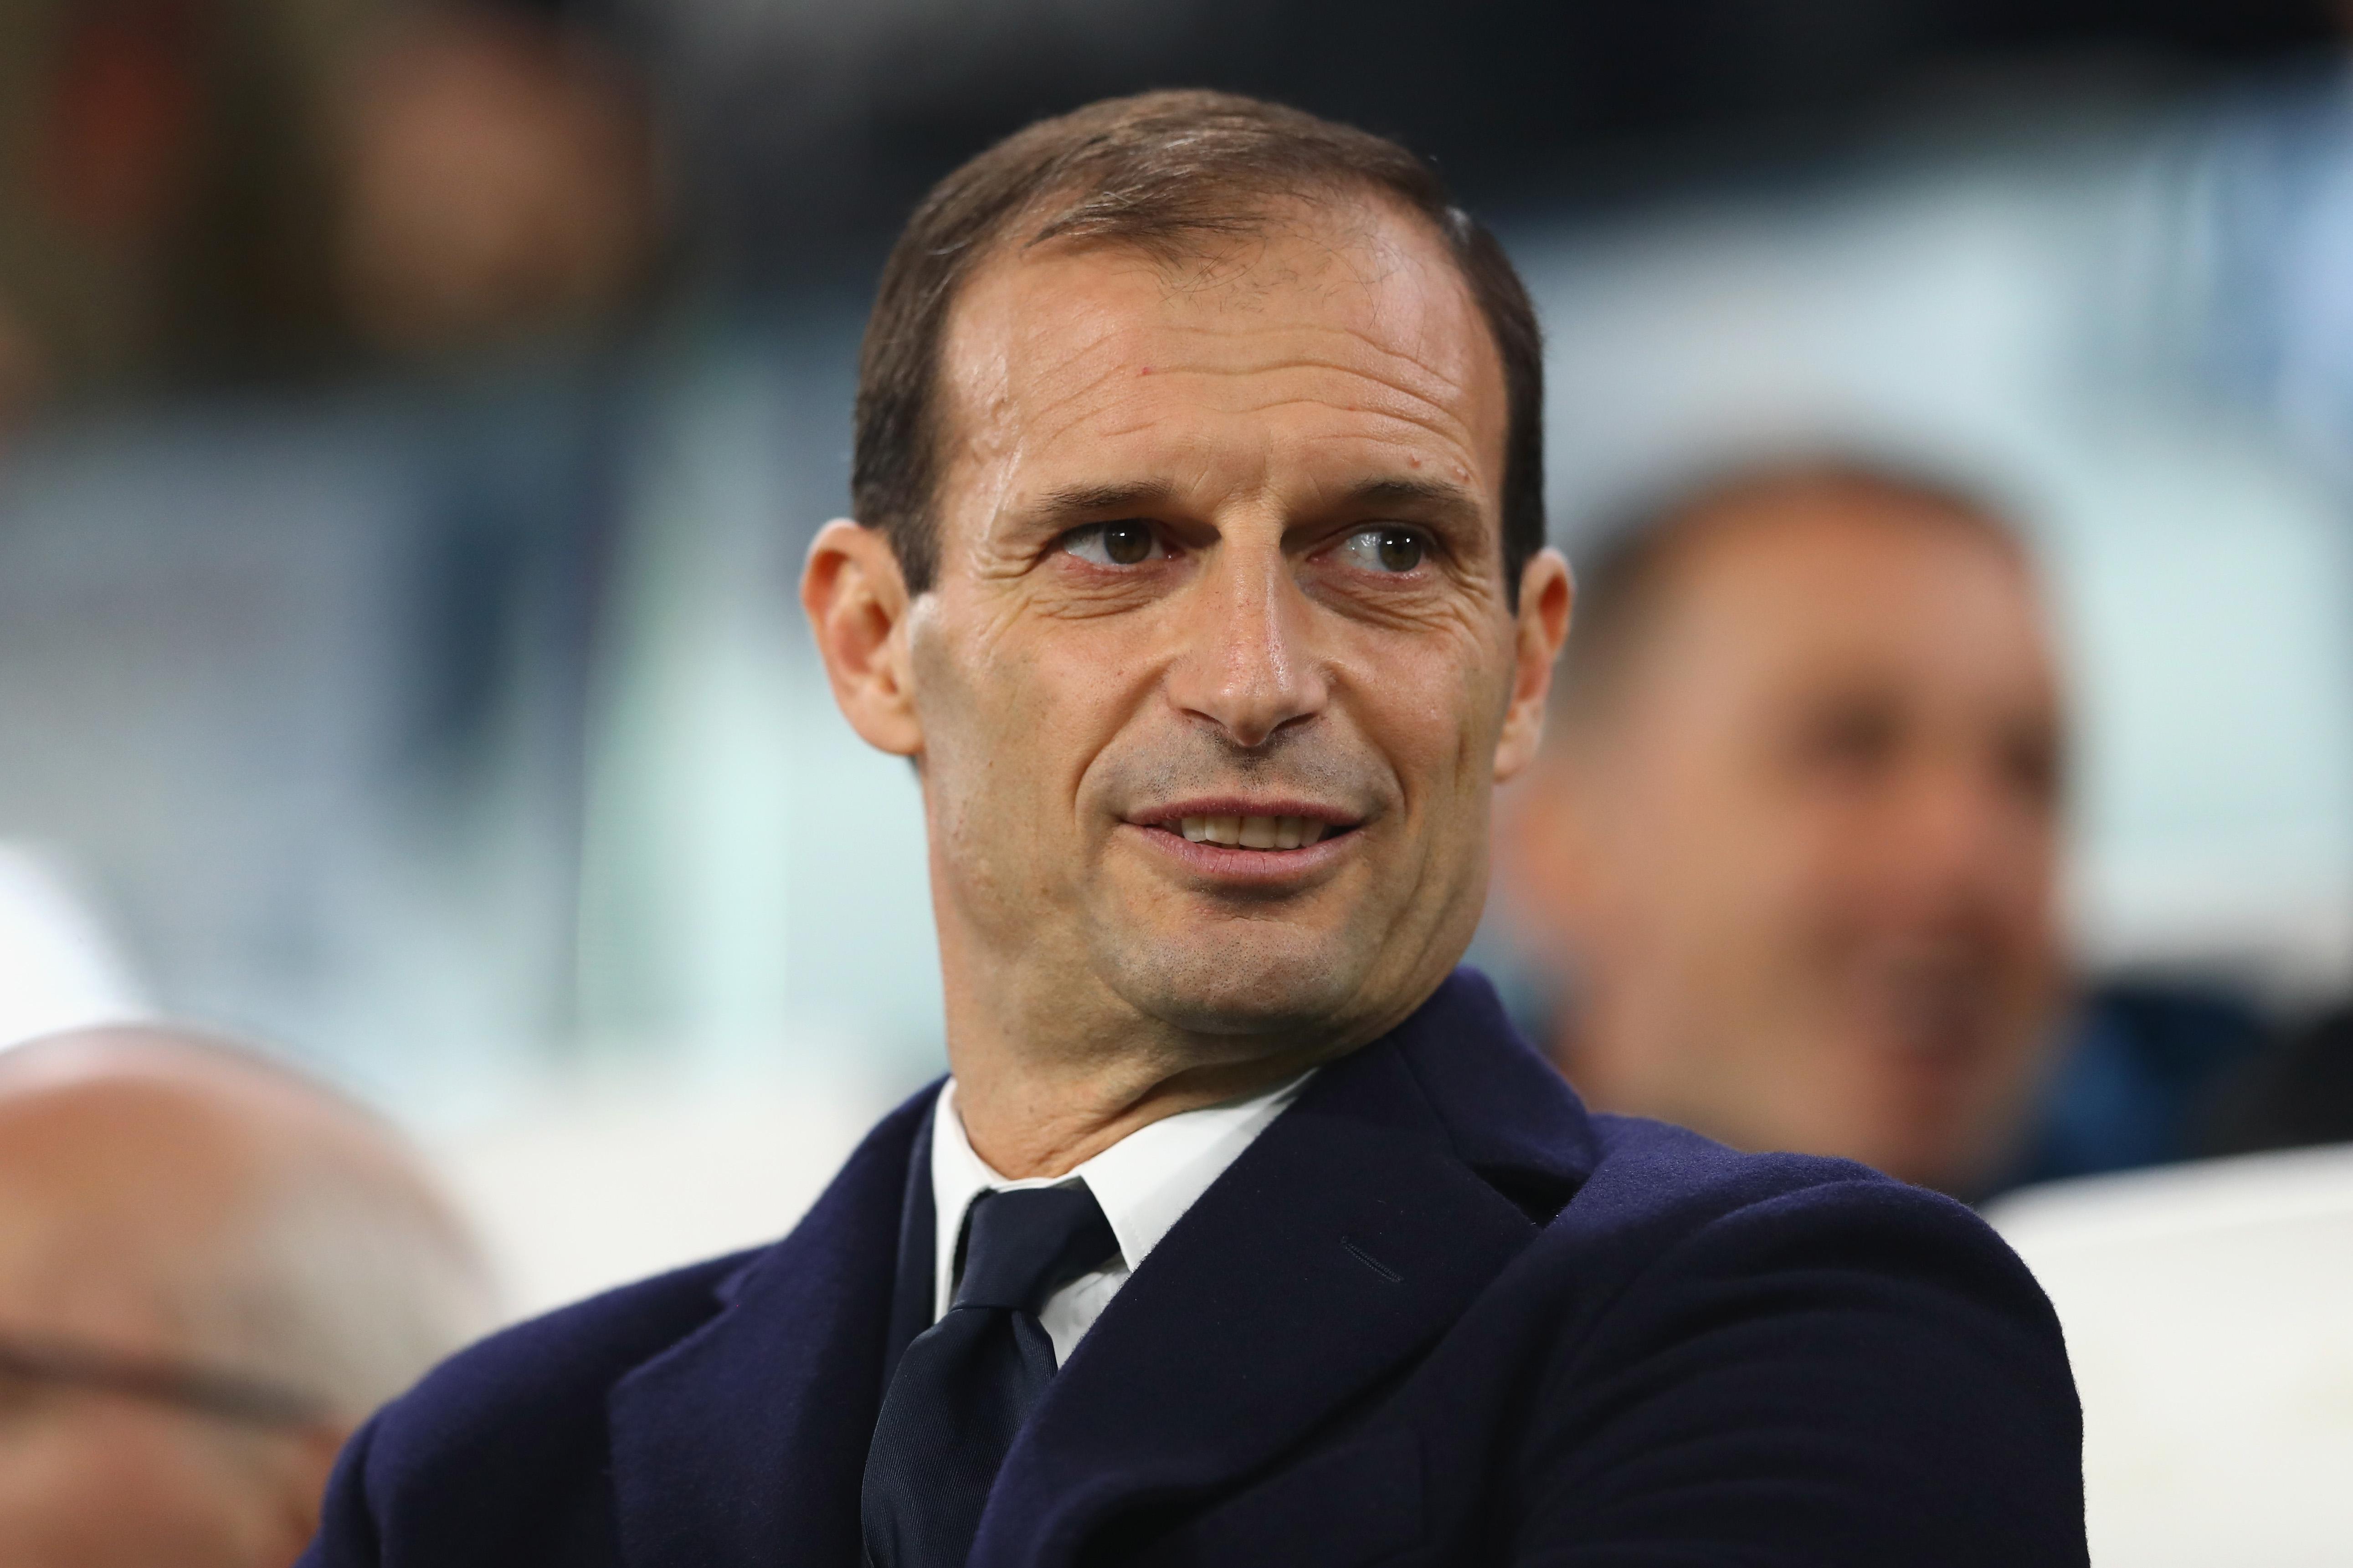 Треньорът на Ювентус Масимилиано Алегри изрази умерен оптимизъм сред нулевото